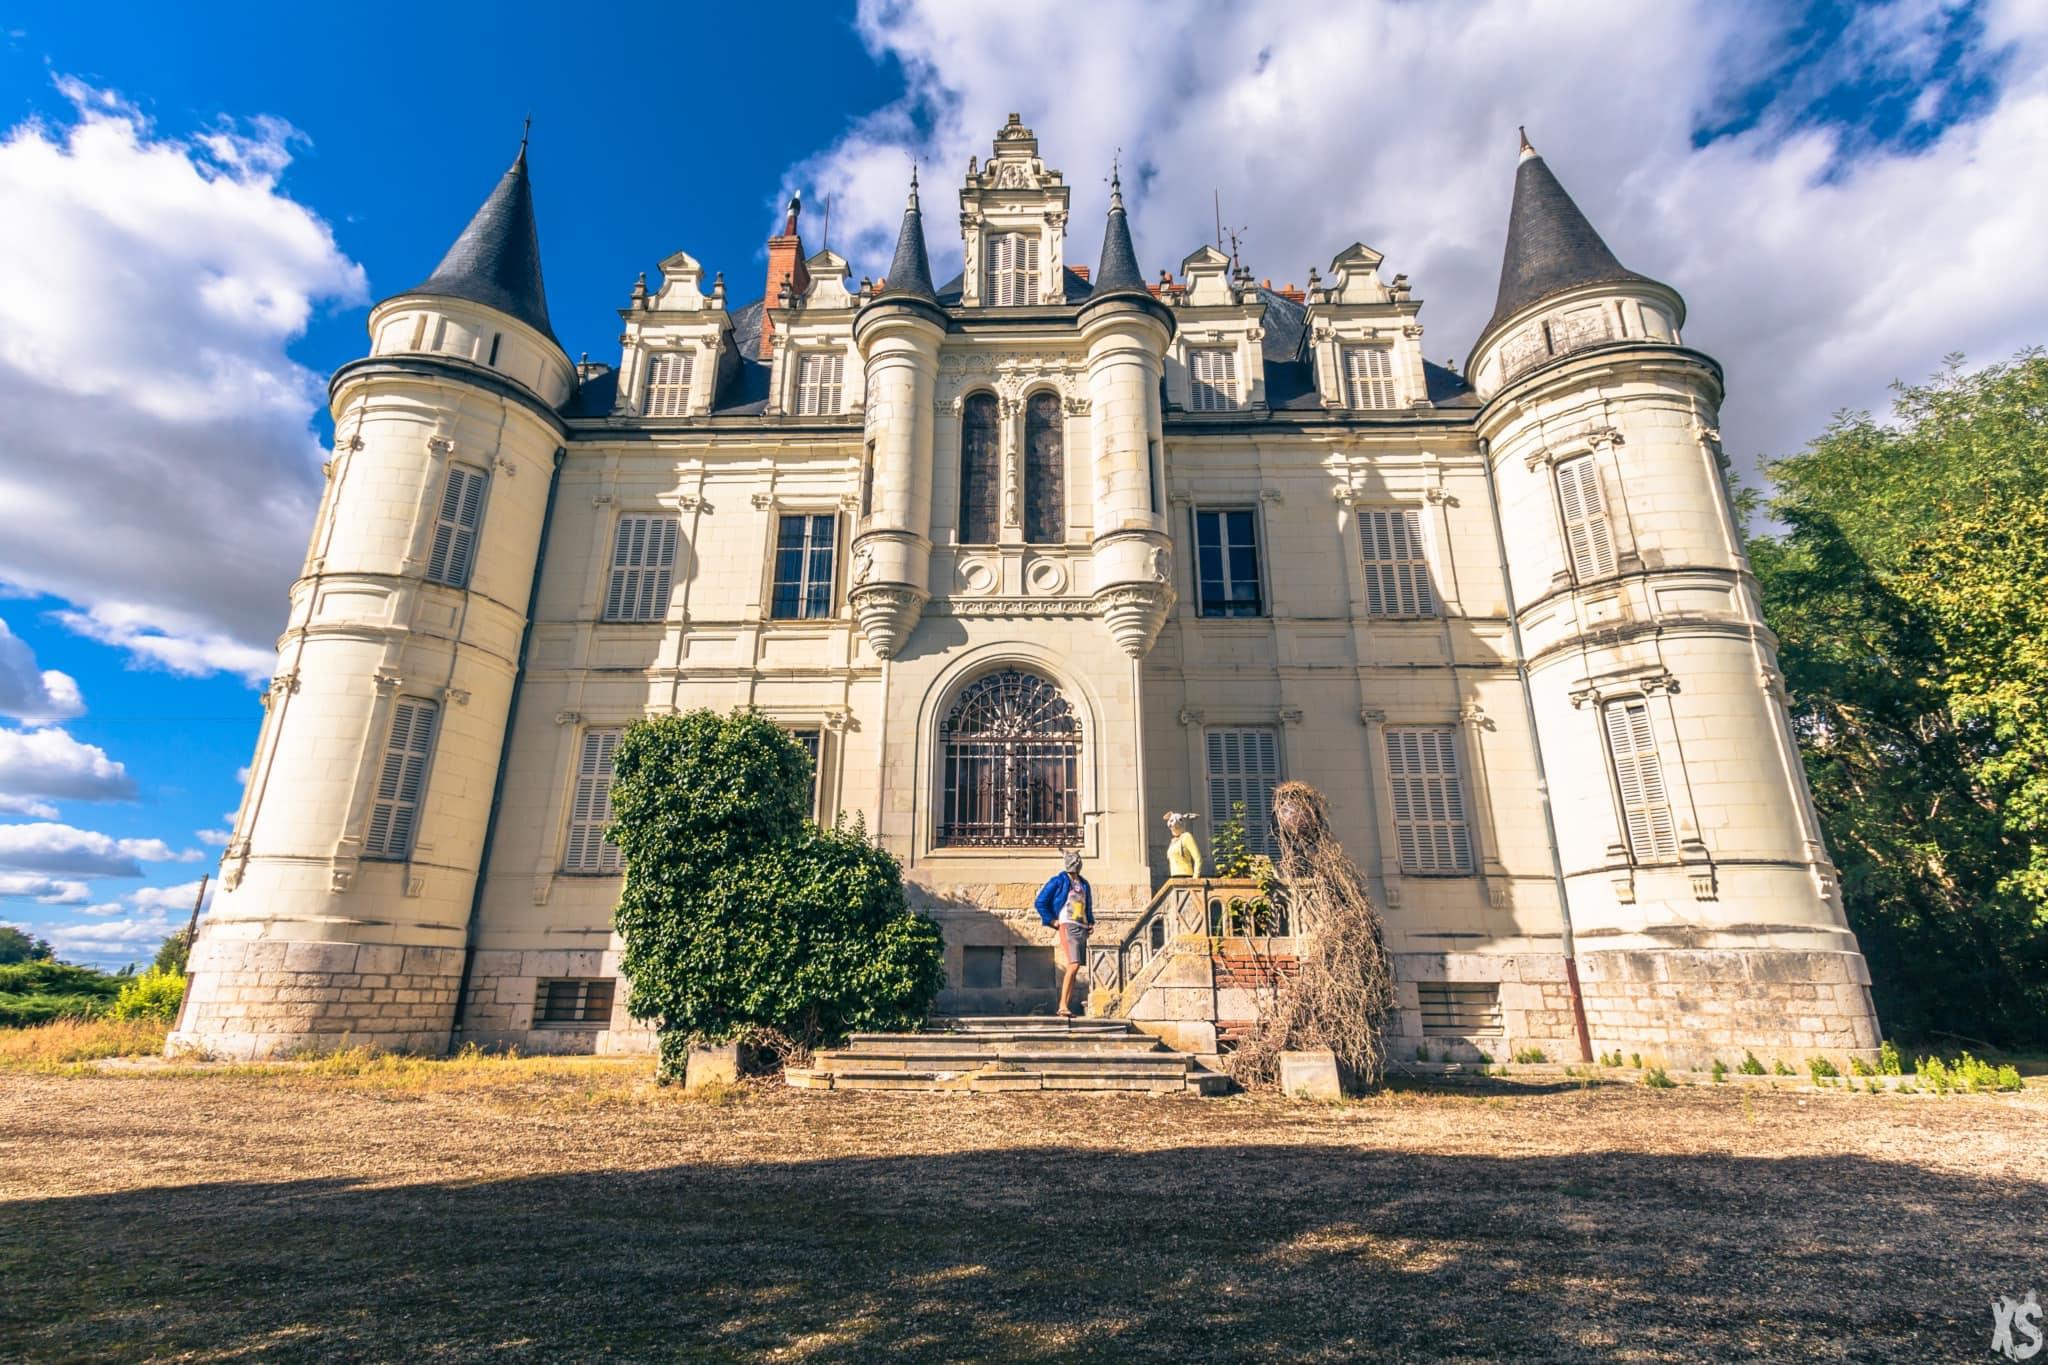 Château Rodney Alcala - Château Poséidon | urbexsession.com/chateau-rodney-alcala | Urbex France